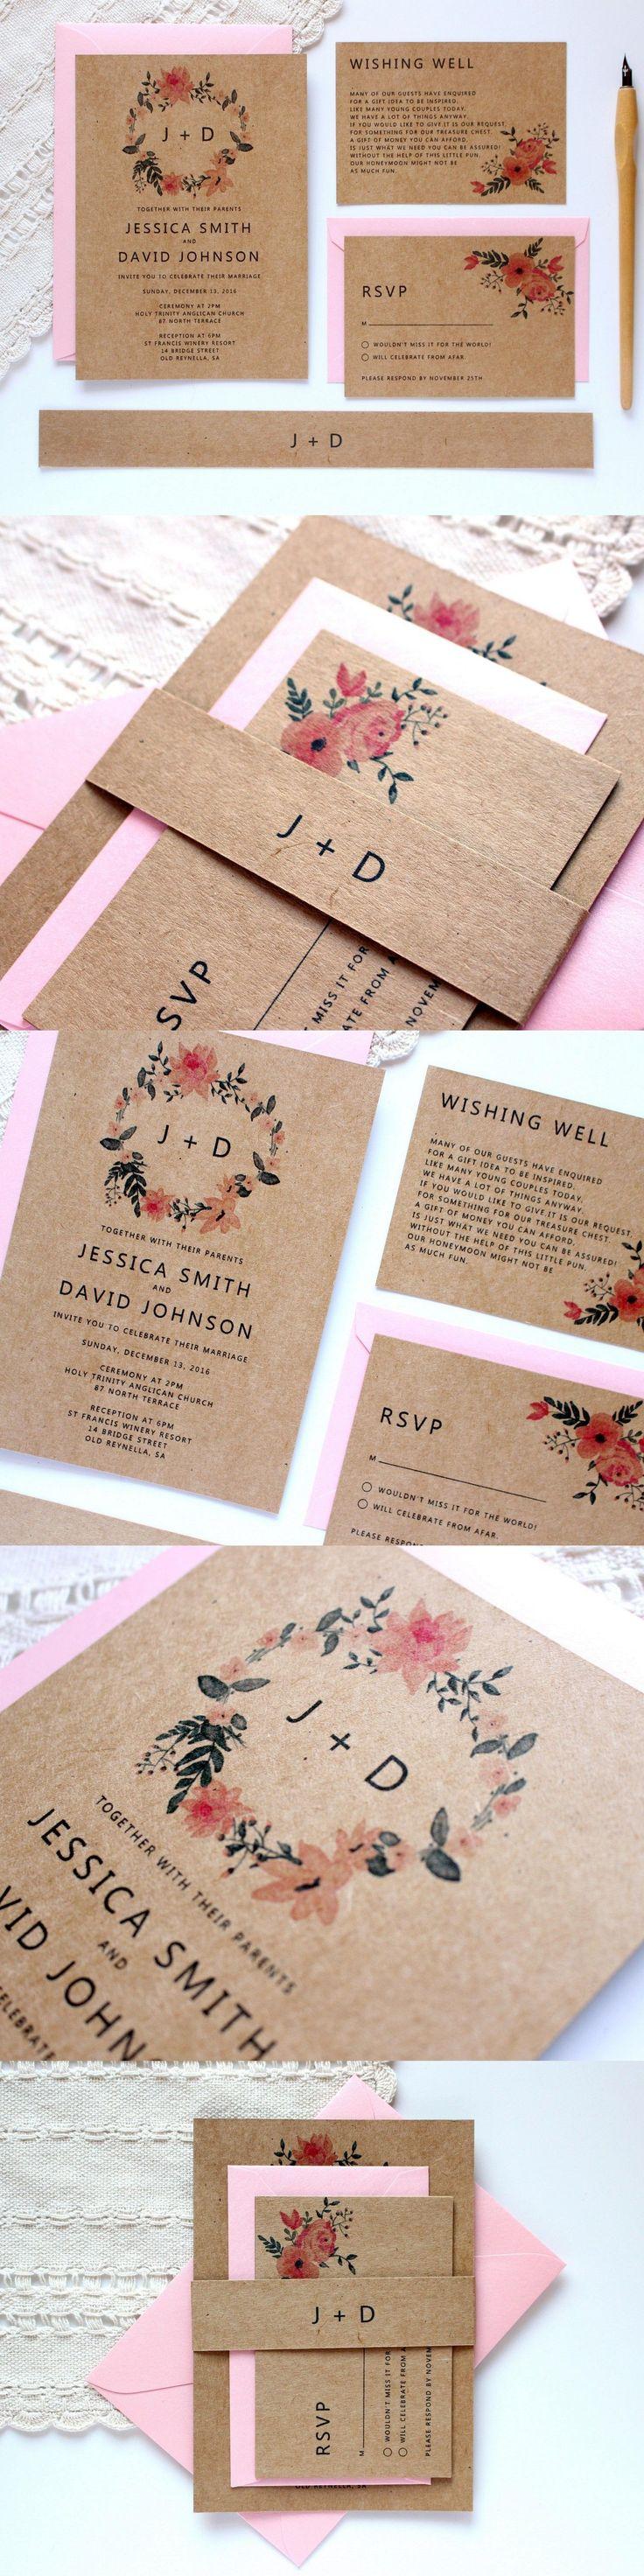 watch wedding invitation movie online eng sub%0A Kraft wedding invitation with pink floral wreath by Paper Bound Love   weddinginvitation